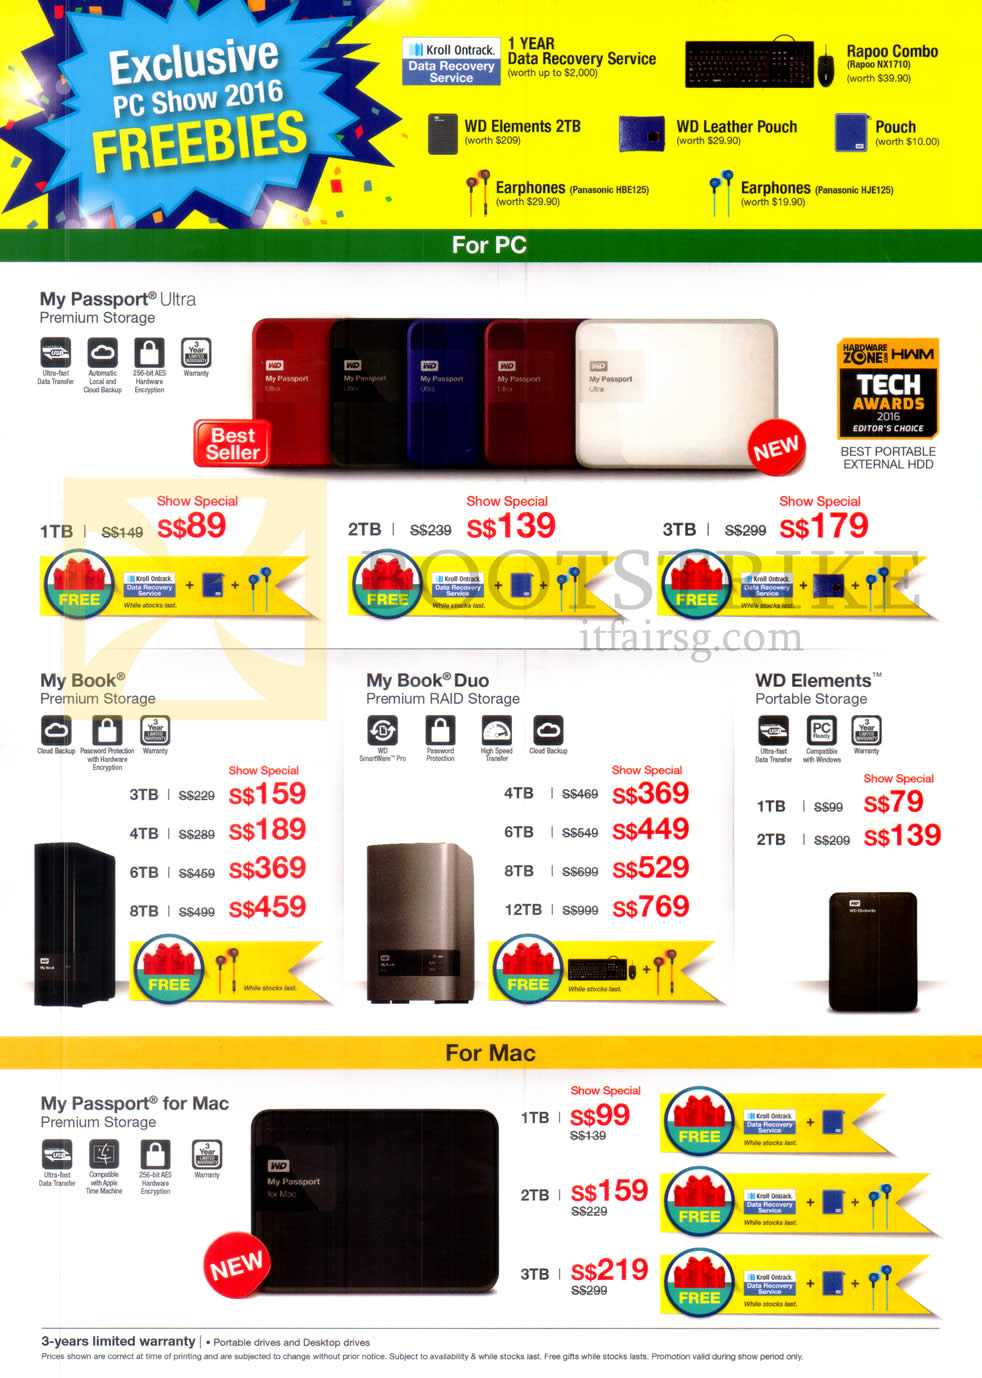 Western Digital External Hard Disk Drives My Passport Ultra Book Wd 1tb Hd Pc Show 2016 Price List Image Brochure Of